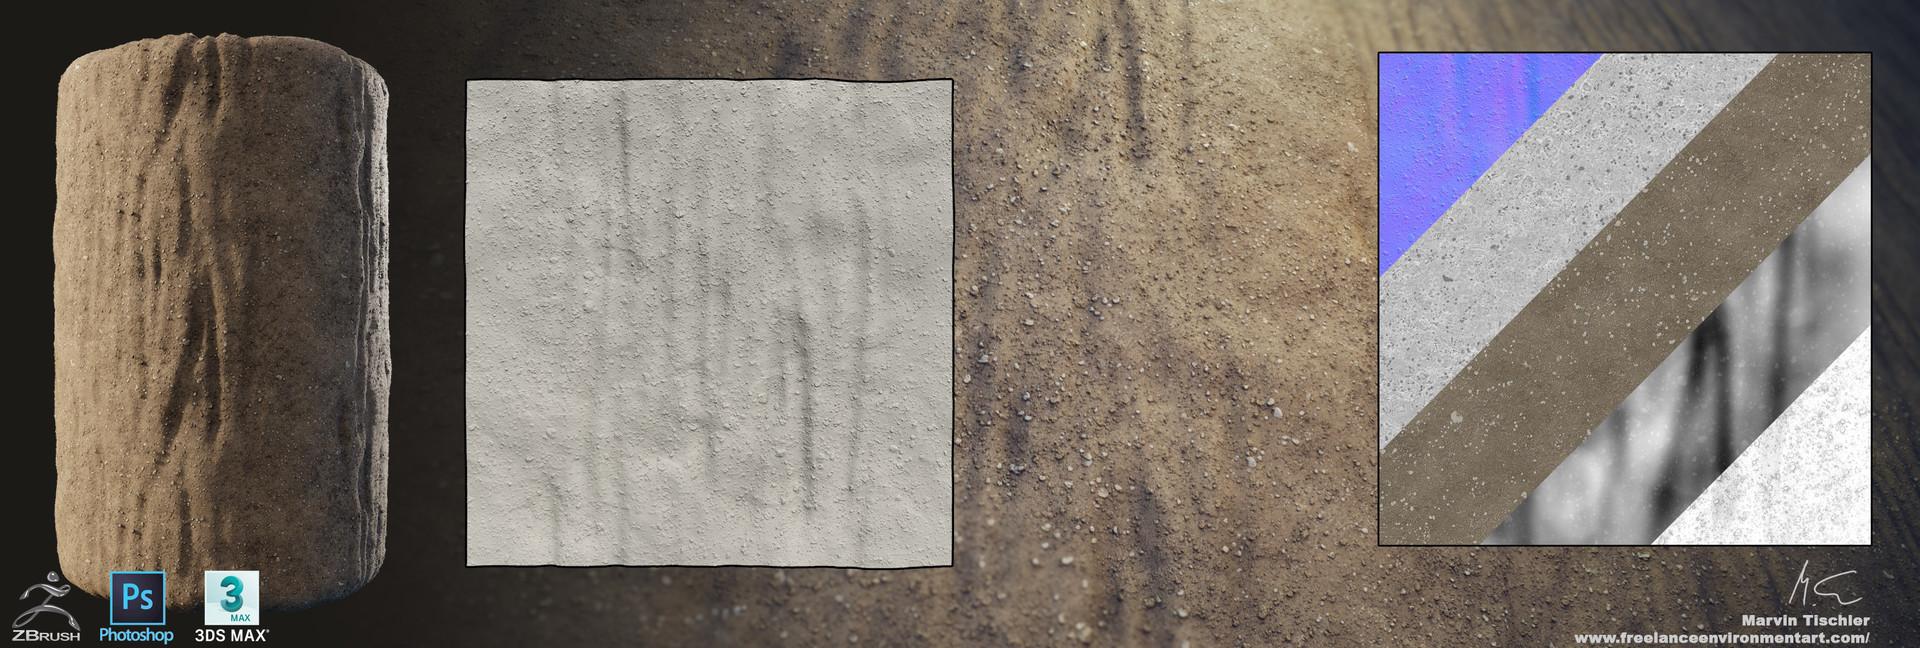 Marvin tischler textures 002 j